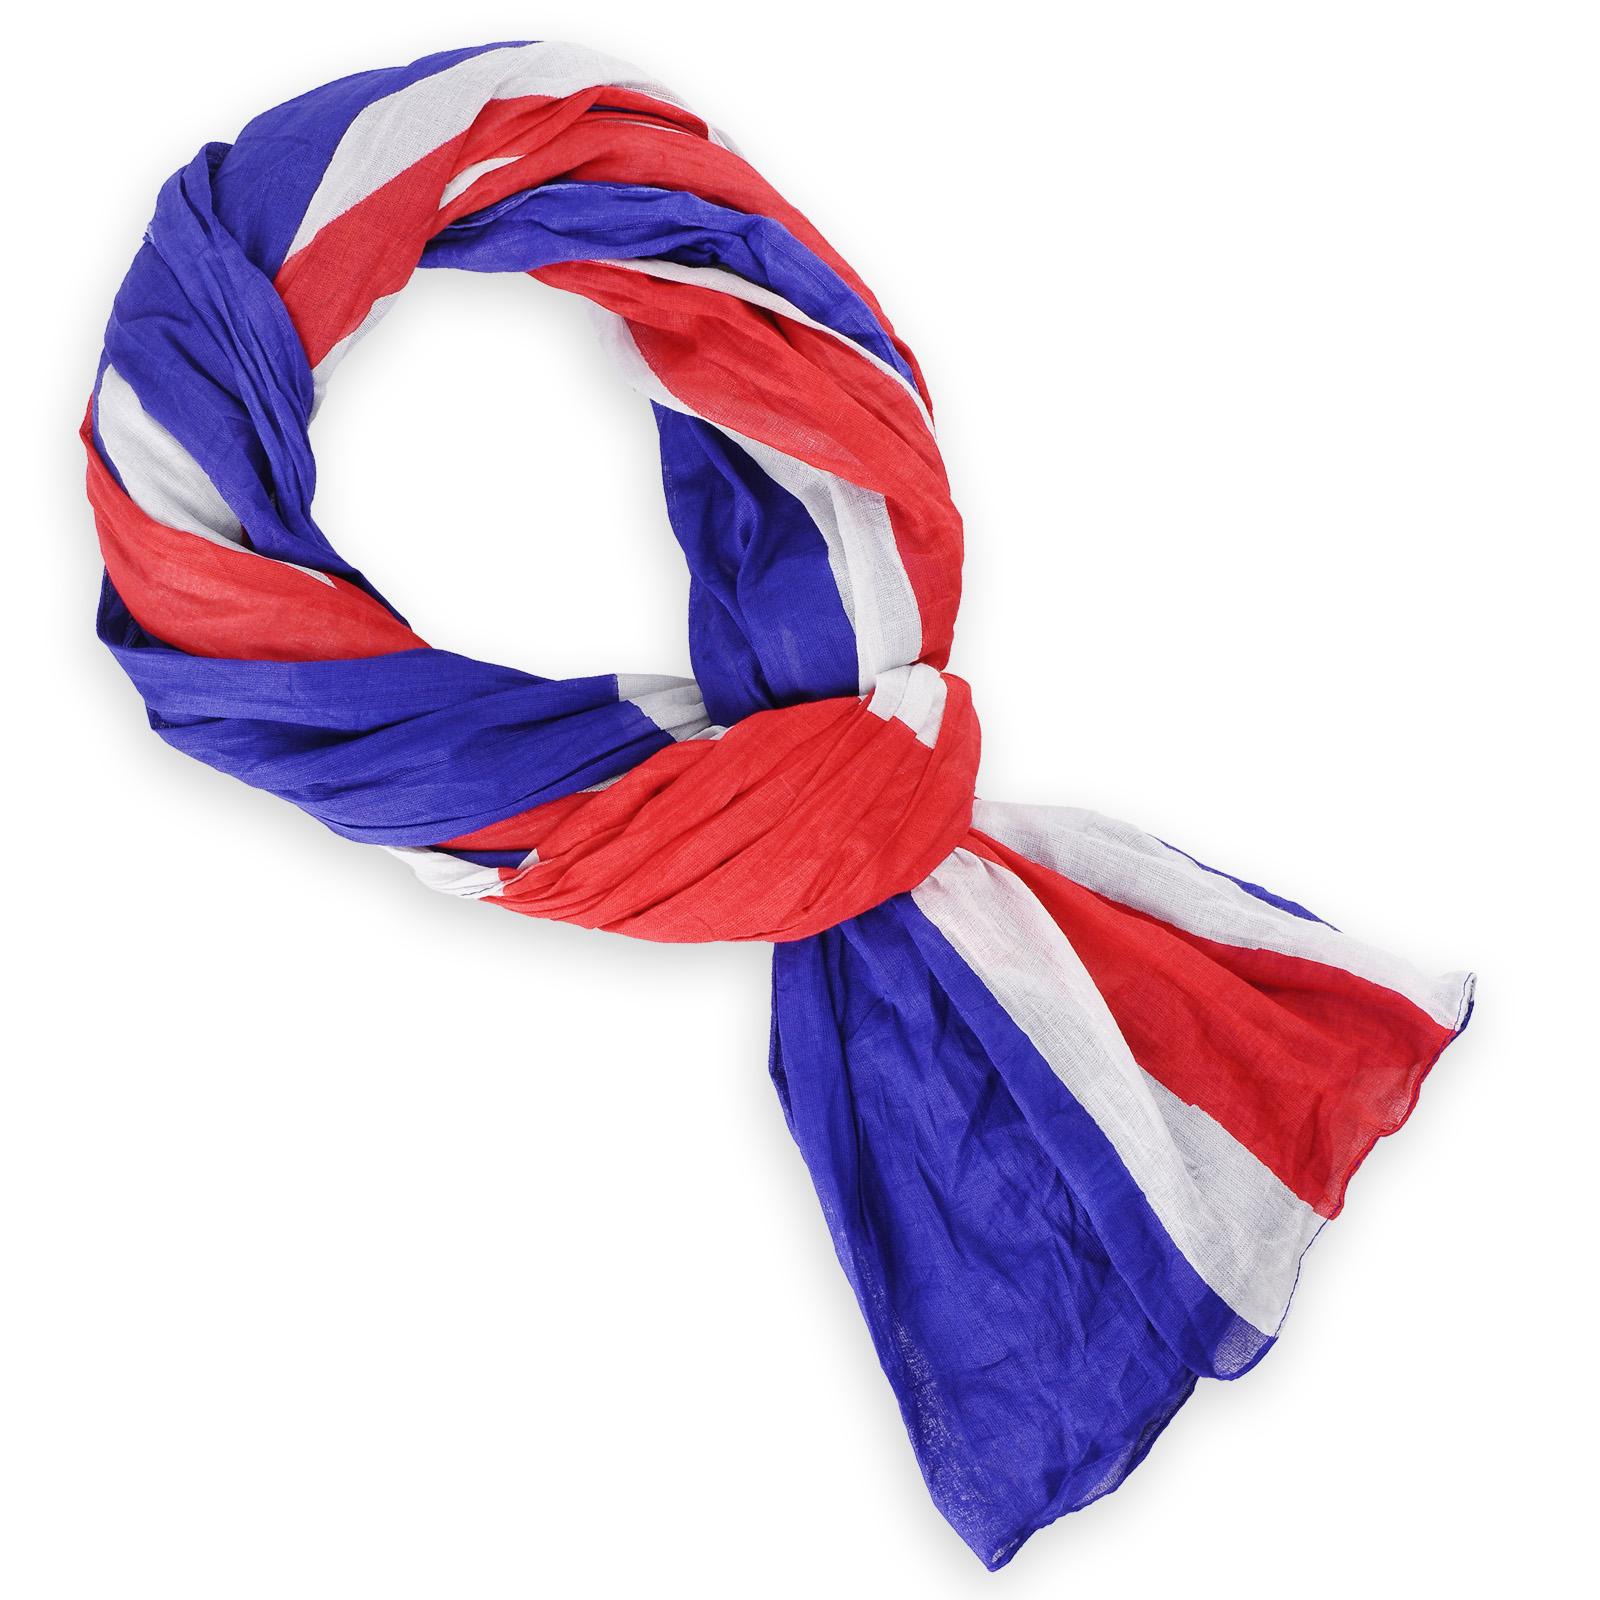 bc108c185717 Chèche - Allée du foulard